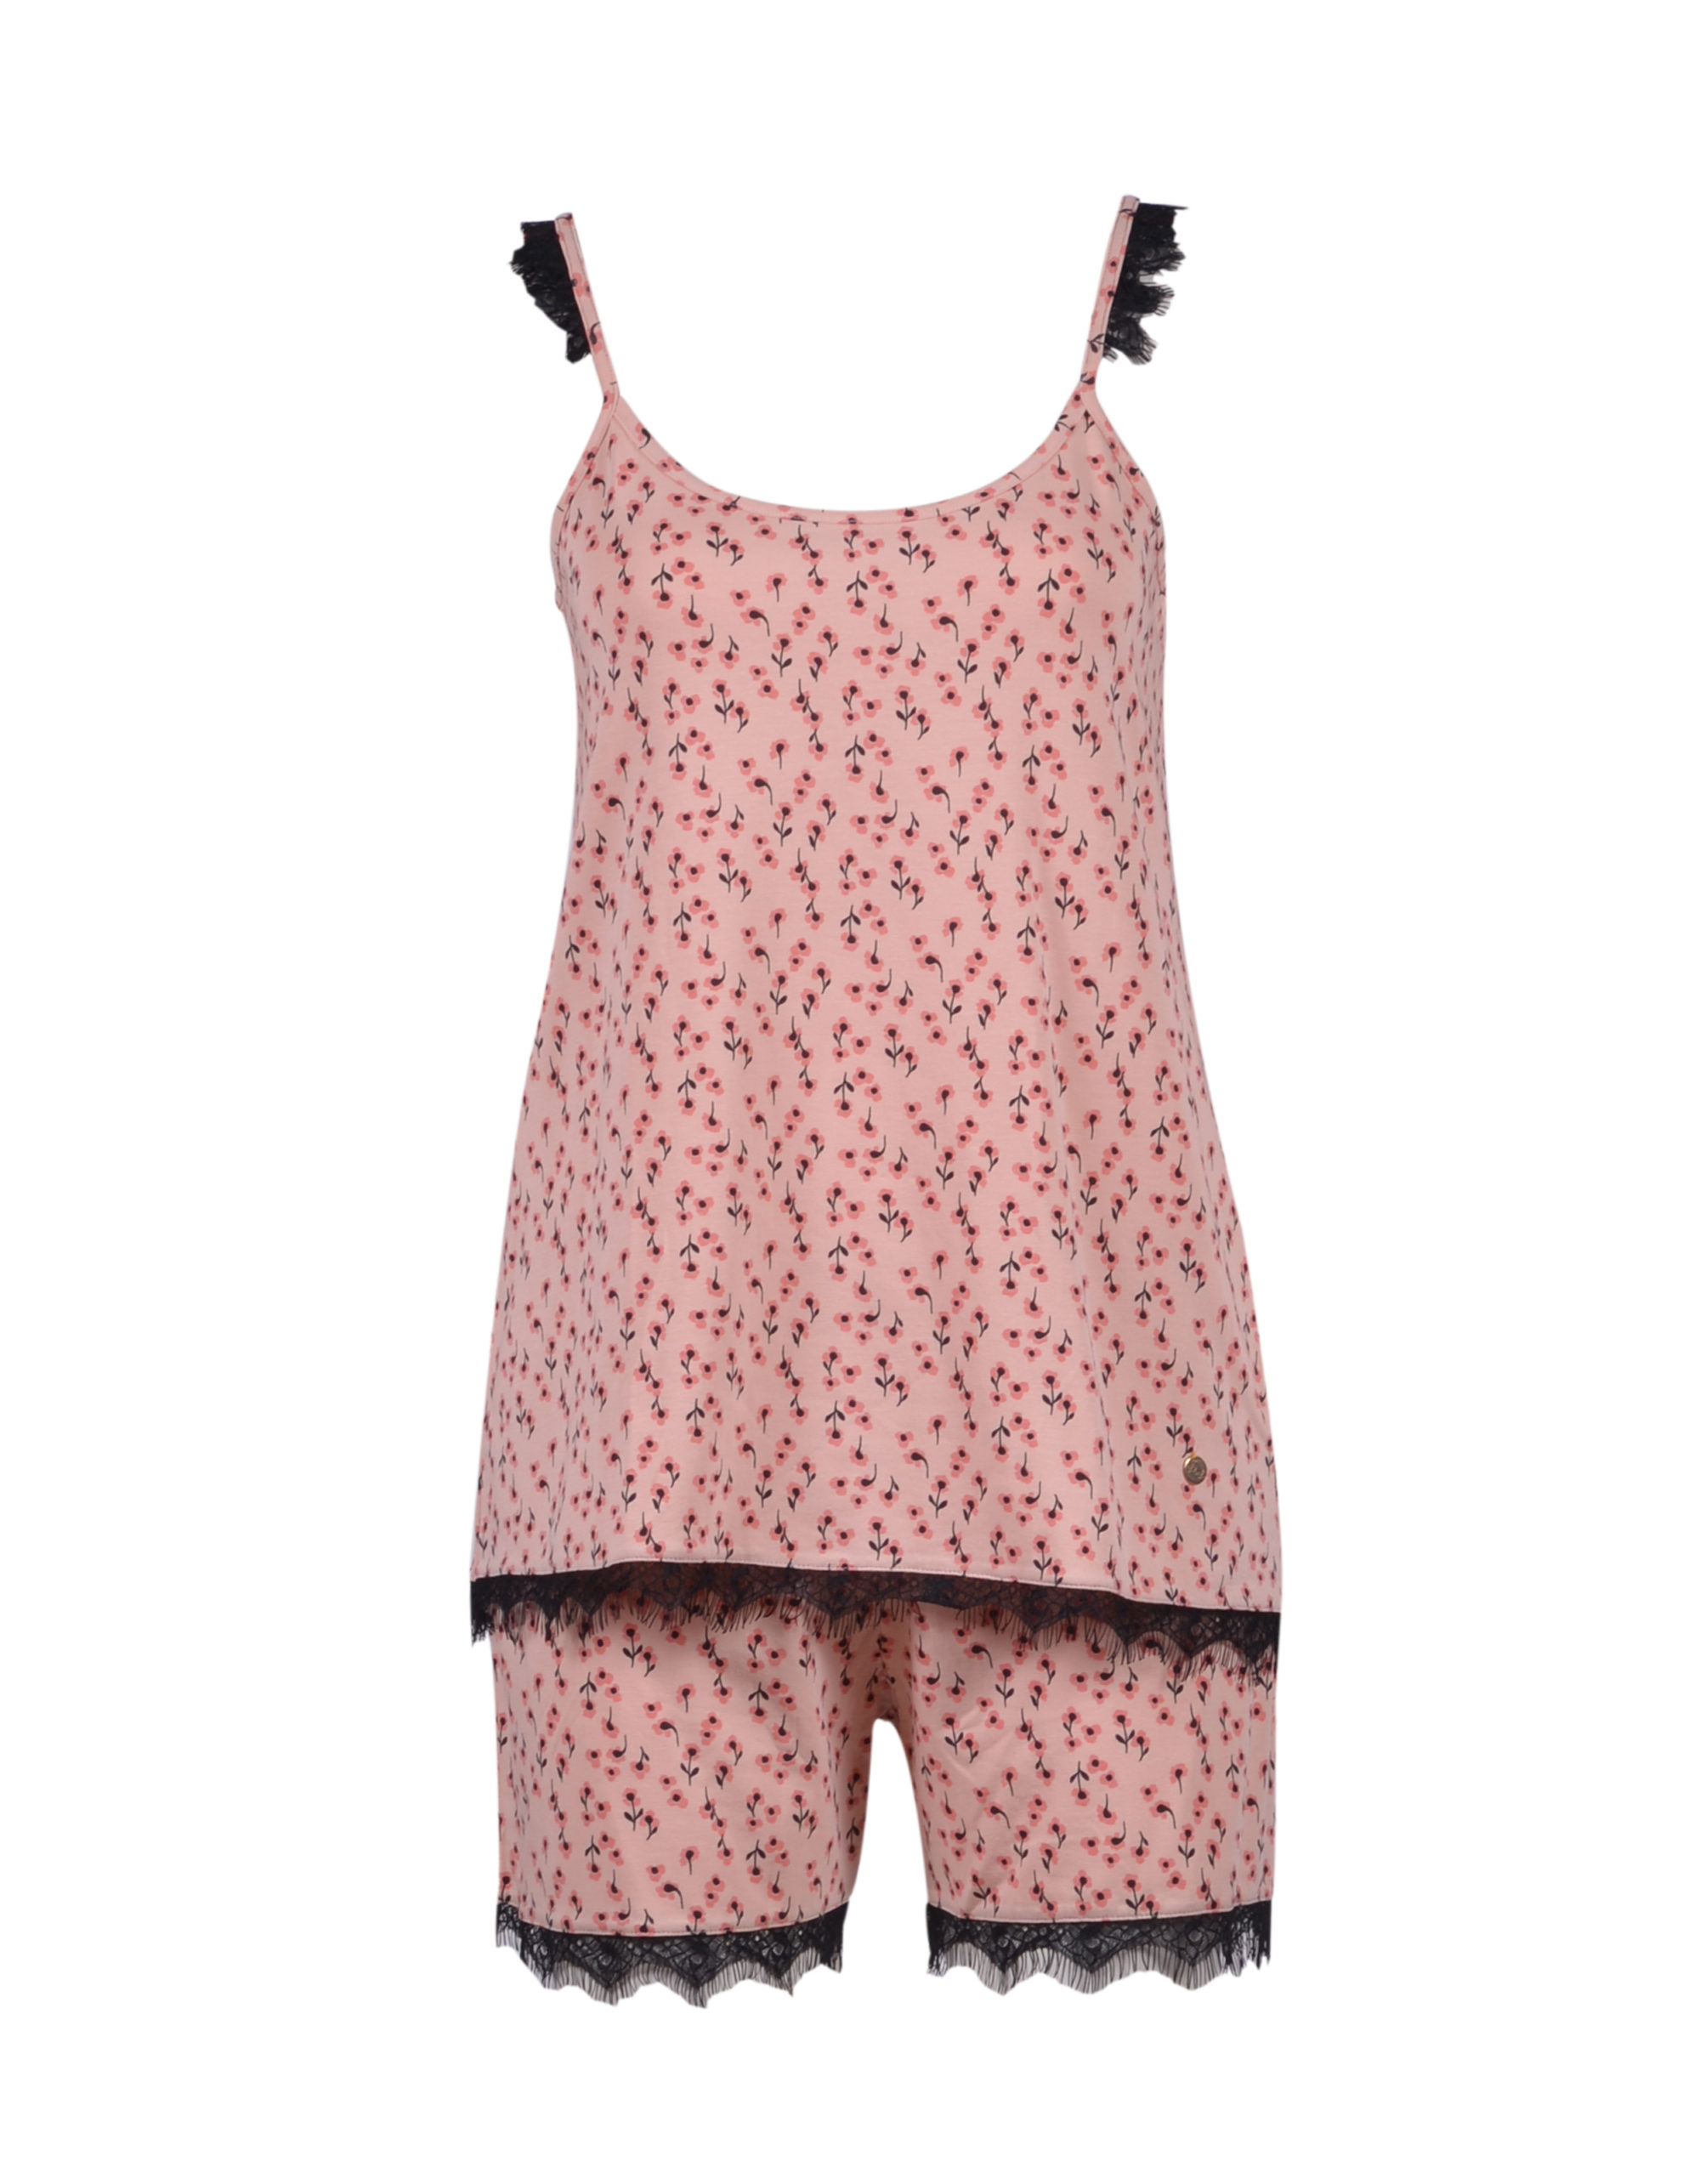 LORDS & LILIES Dames pyjama, abrikoosoranje bloeme